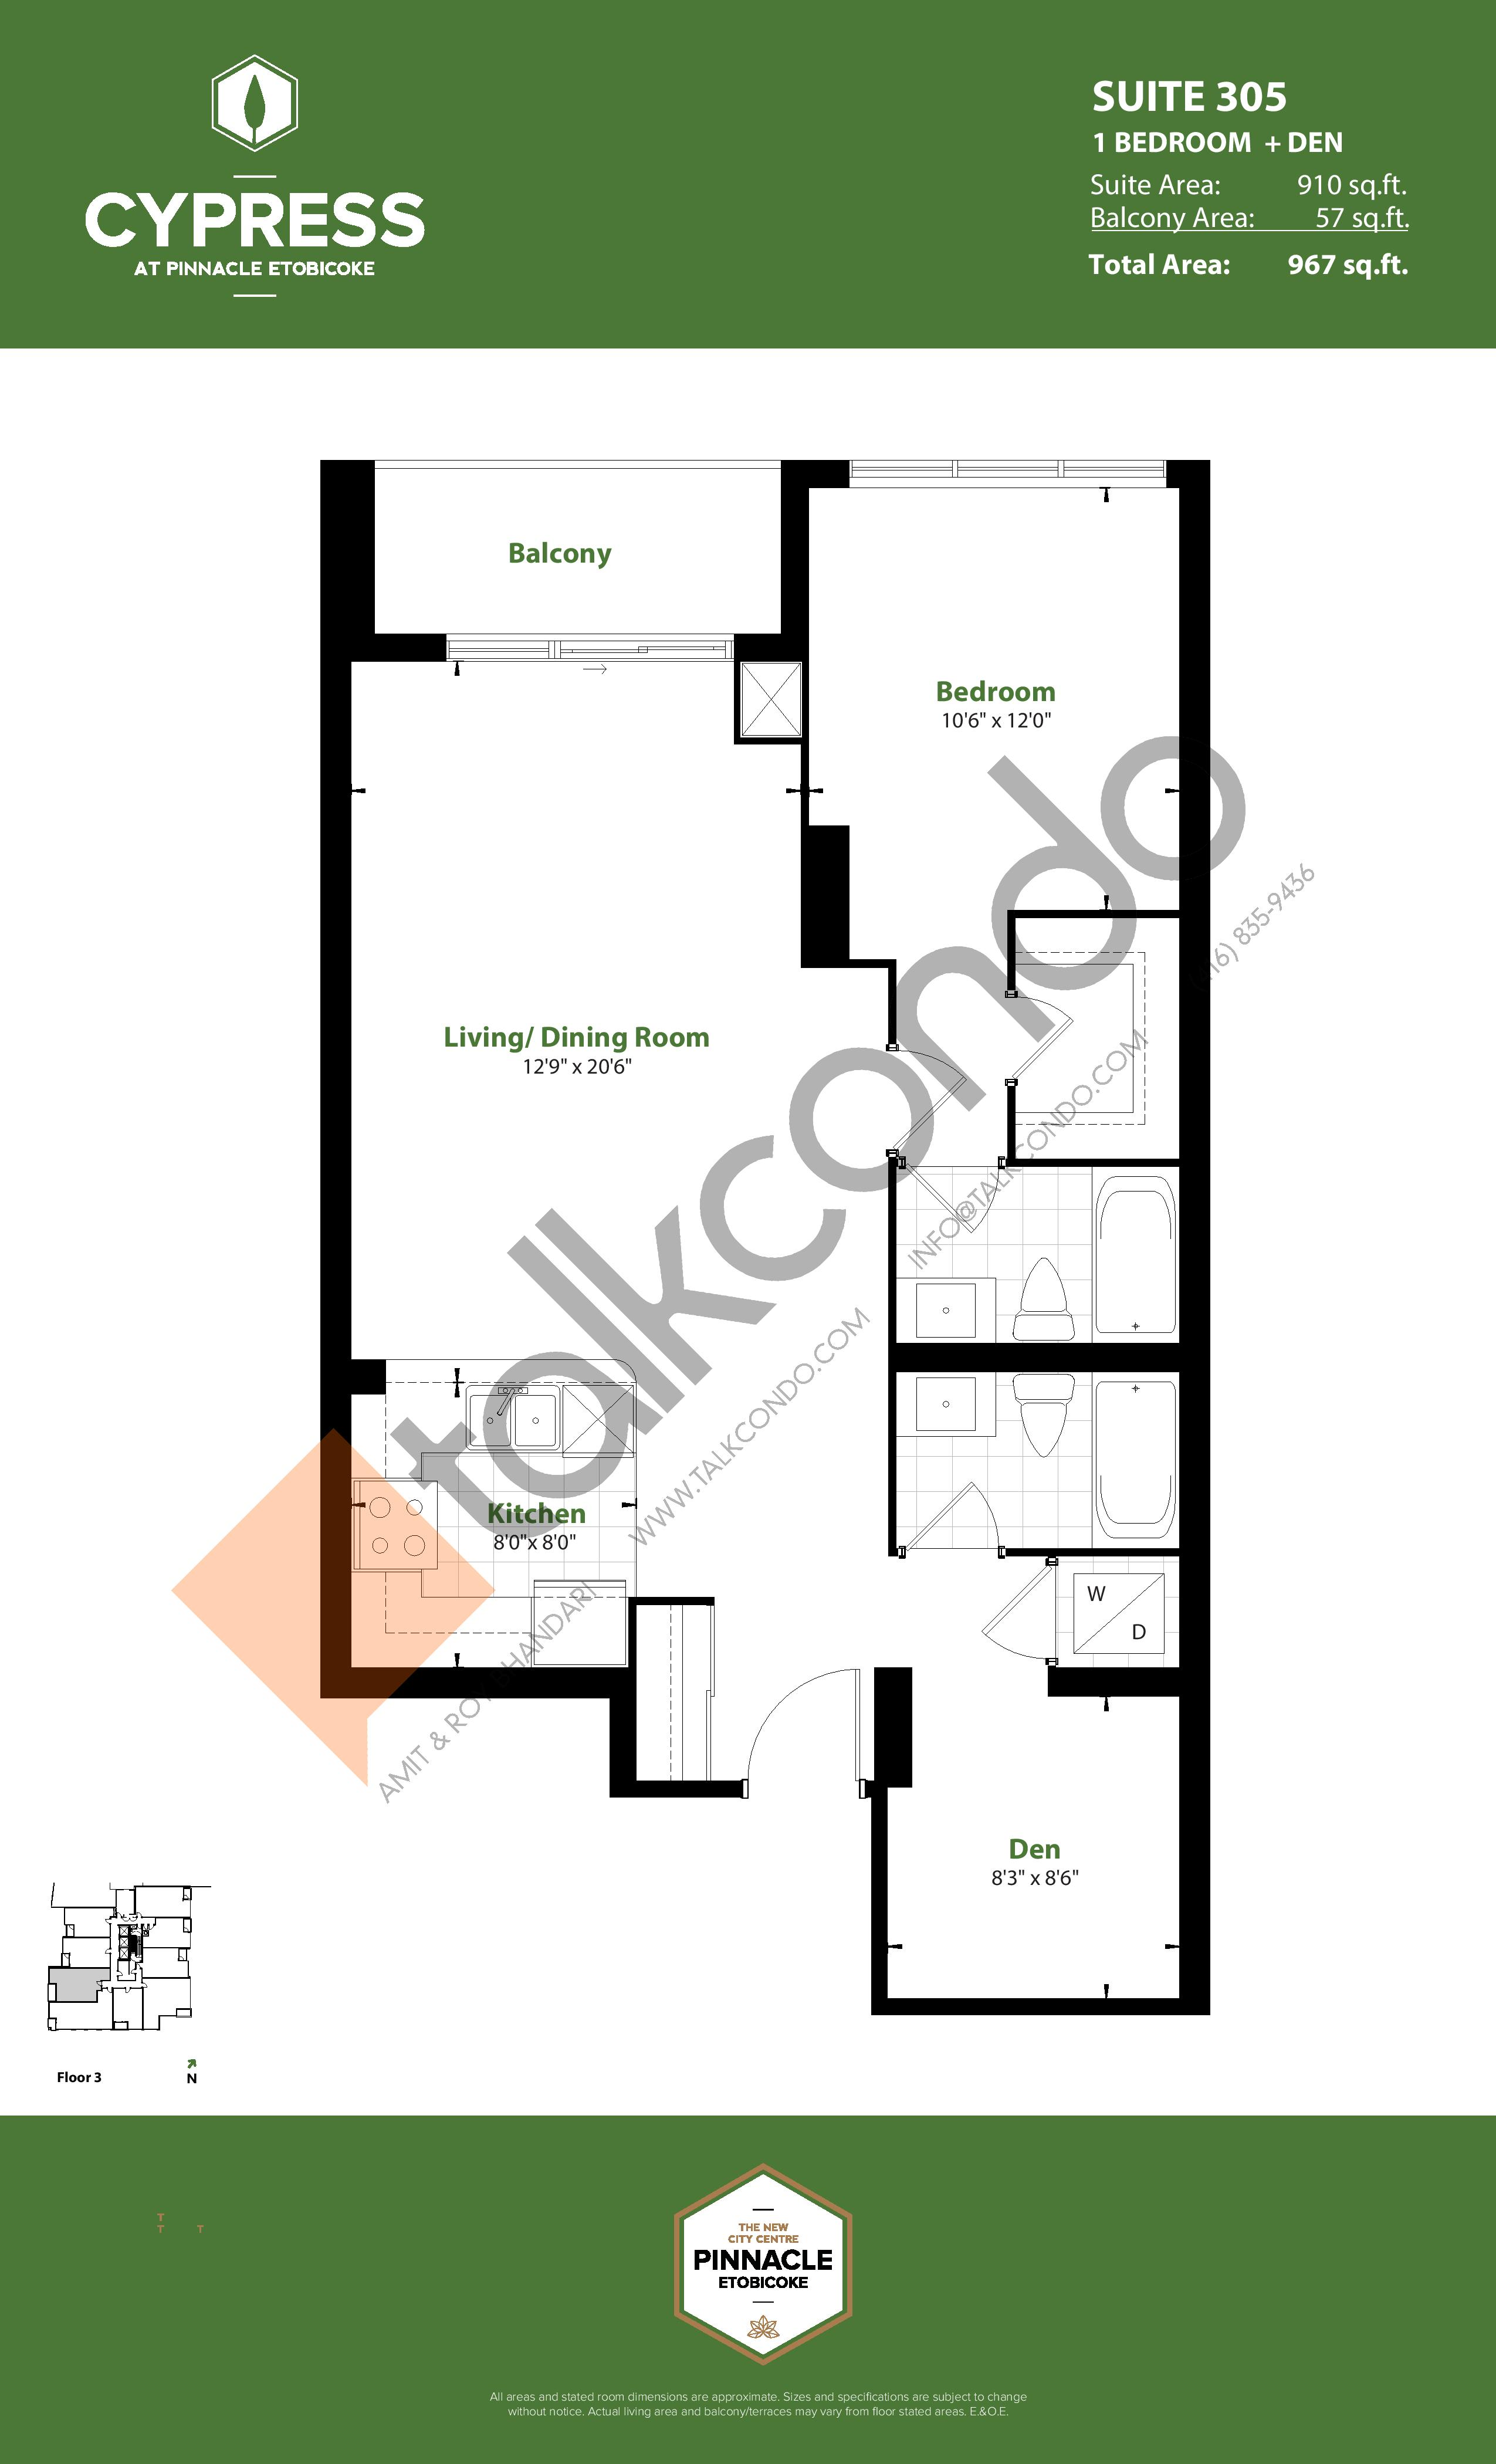 Suite 305 Floor Plan at Cypress at Pinnacle Etobicoke - 910 sq.ft